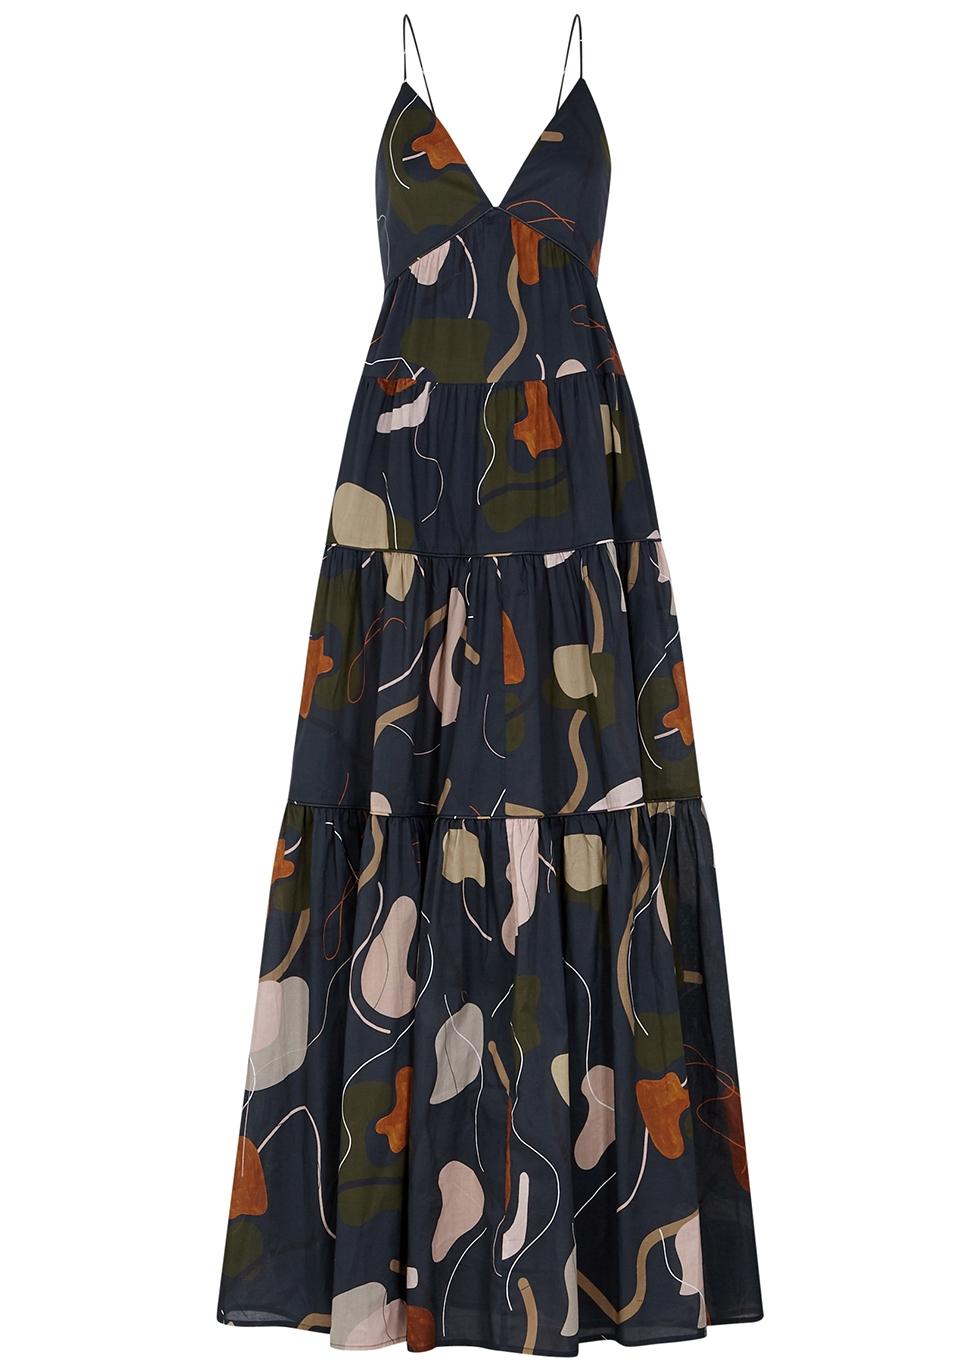 Apollo printed cotton maxi dress